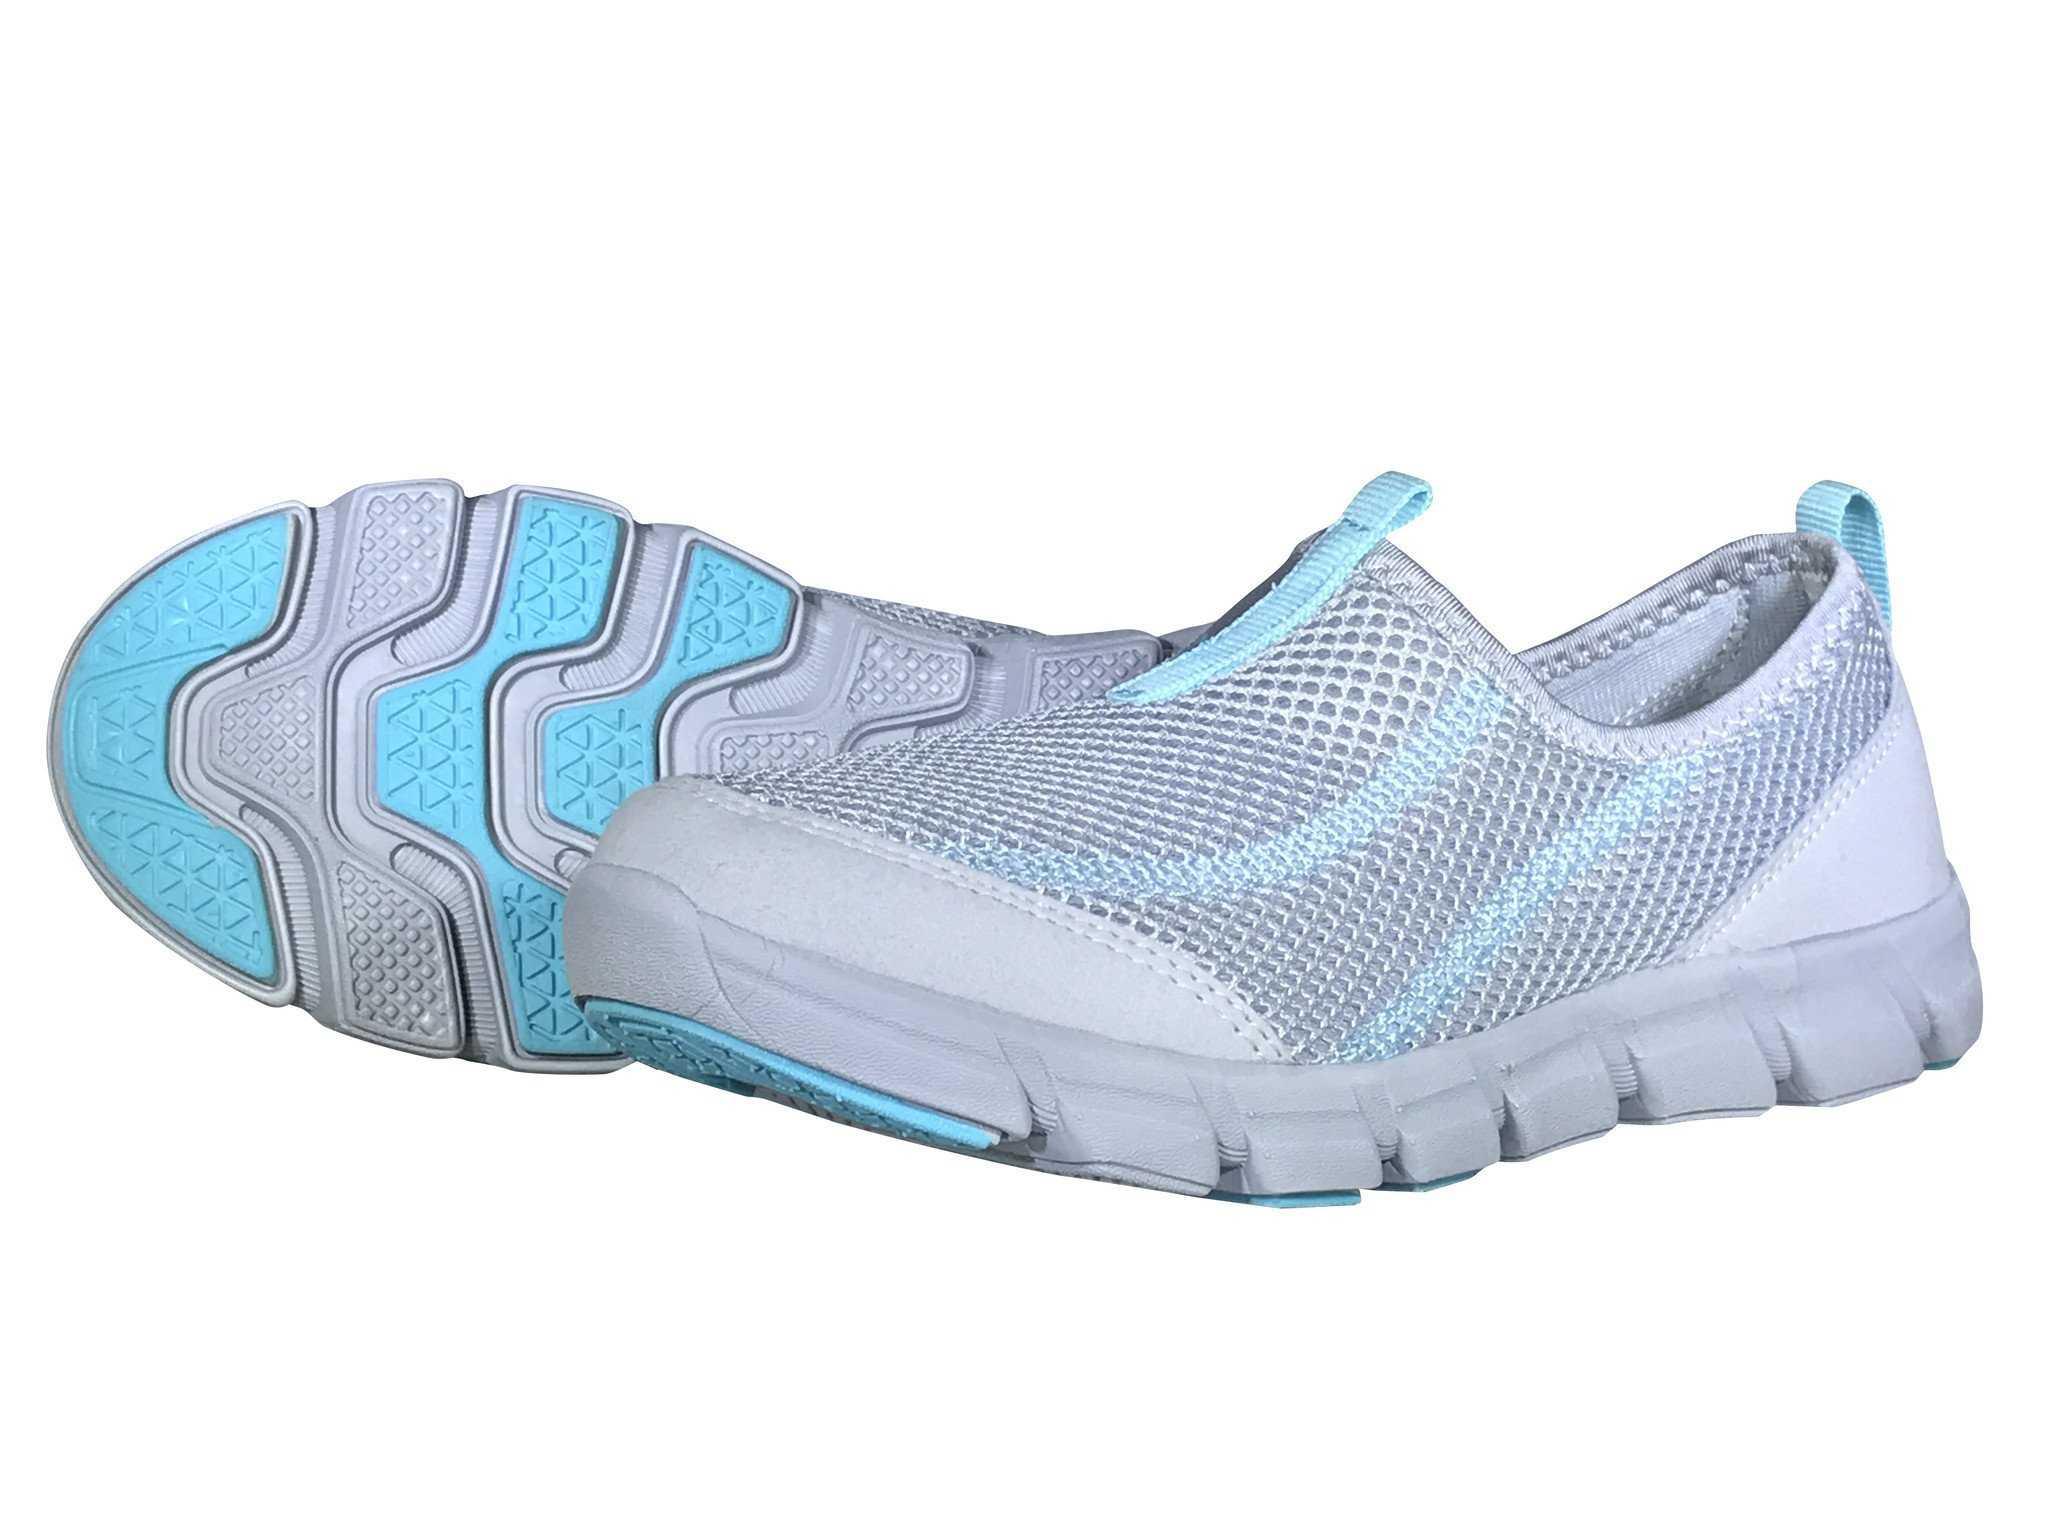 Viakix Water Shoes for Women